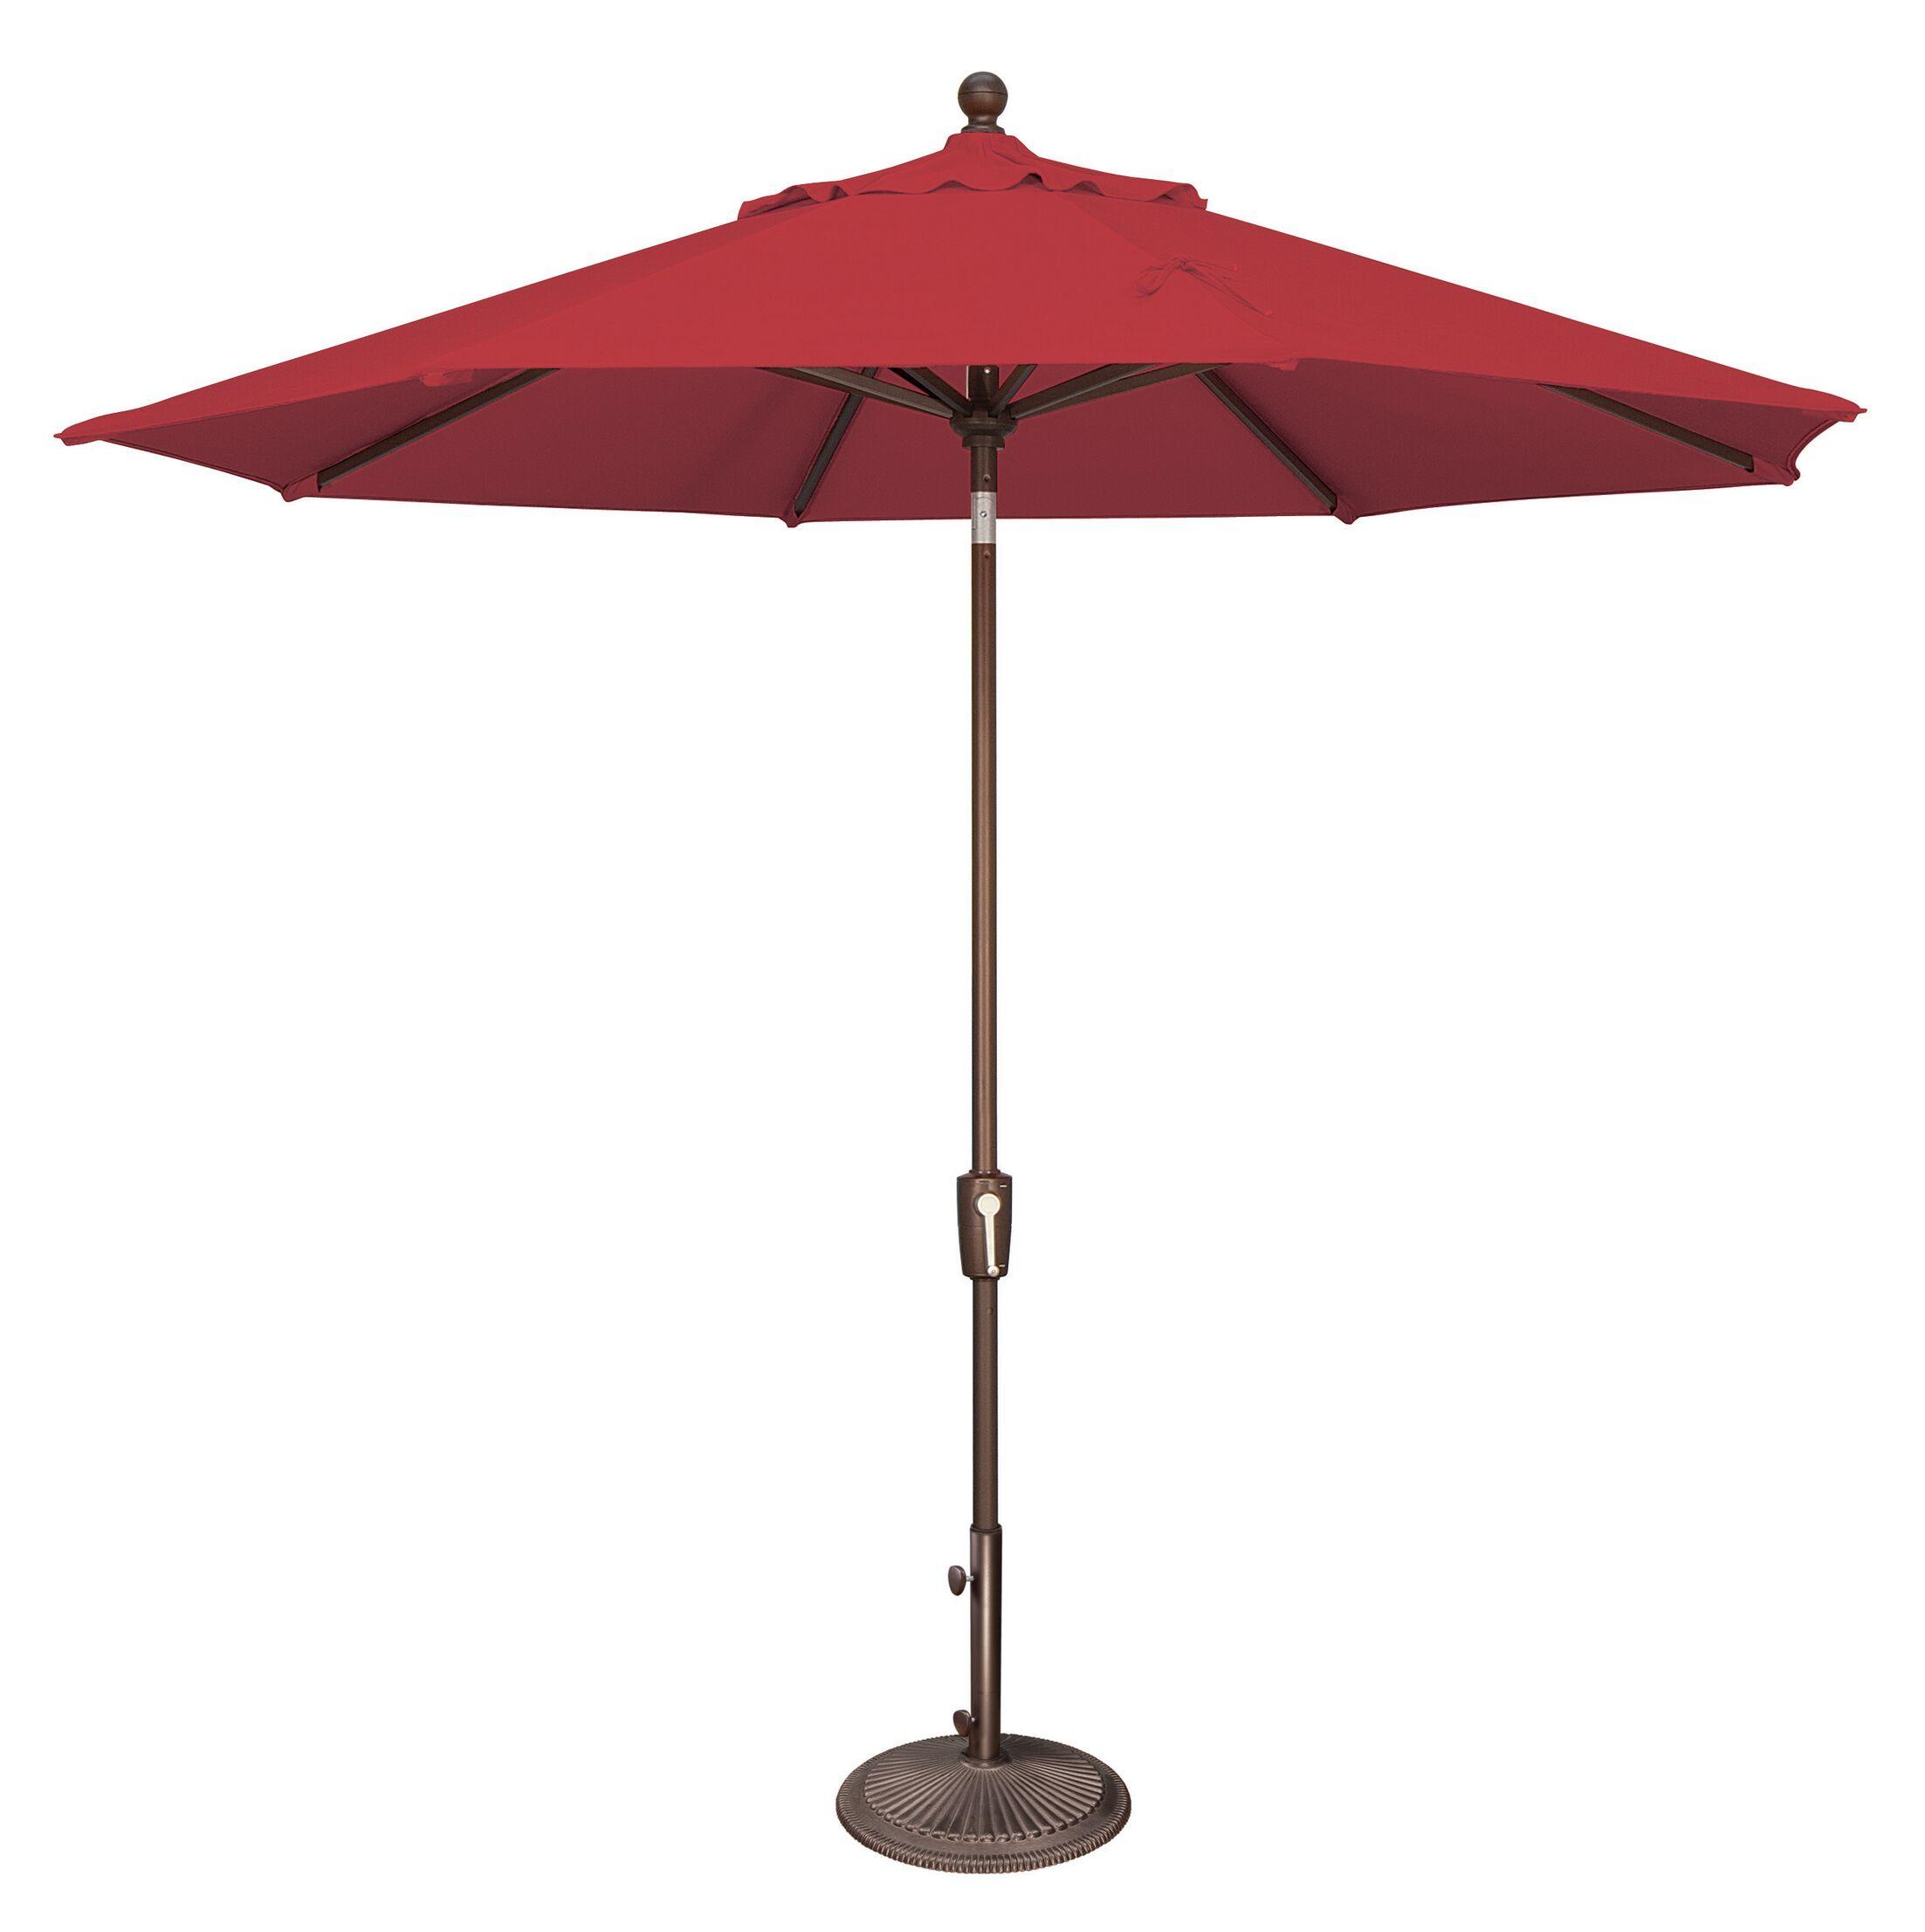 Catalina 9' Market Umbrella Fabric Color: Sunbrella / Jockey Red